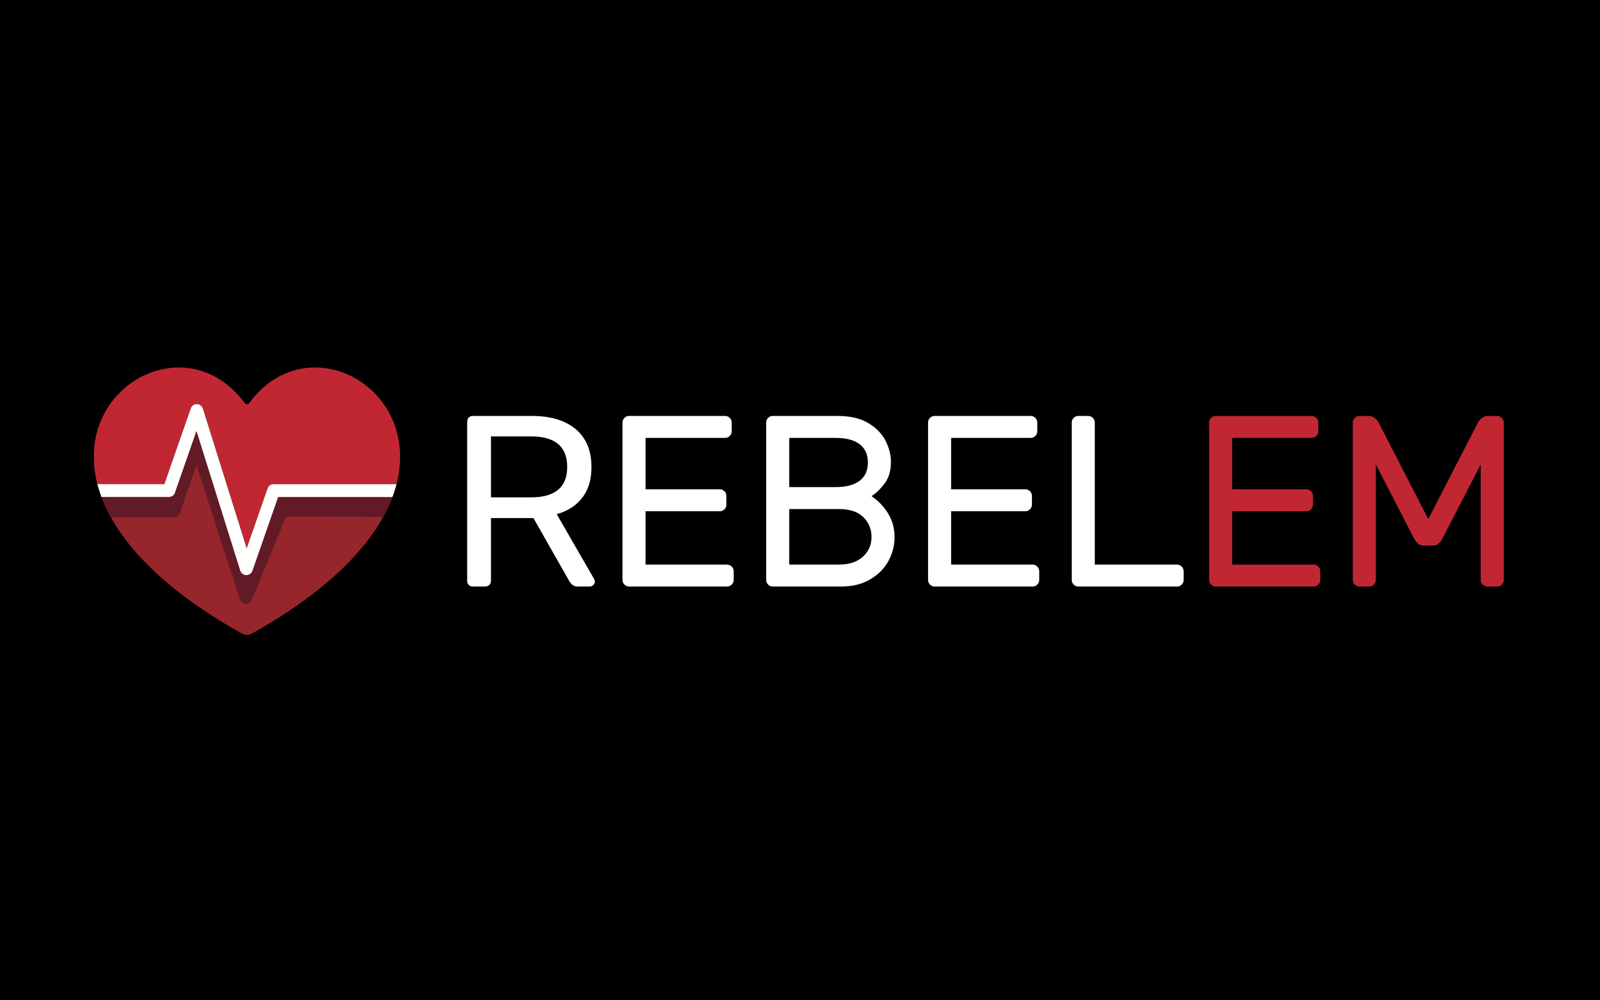 Rebel EM